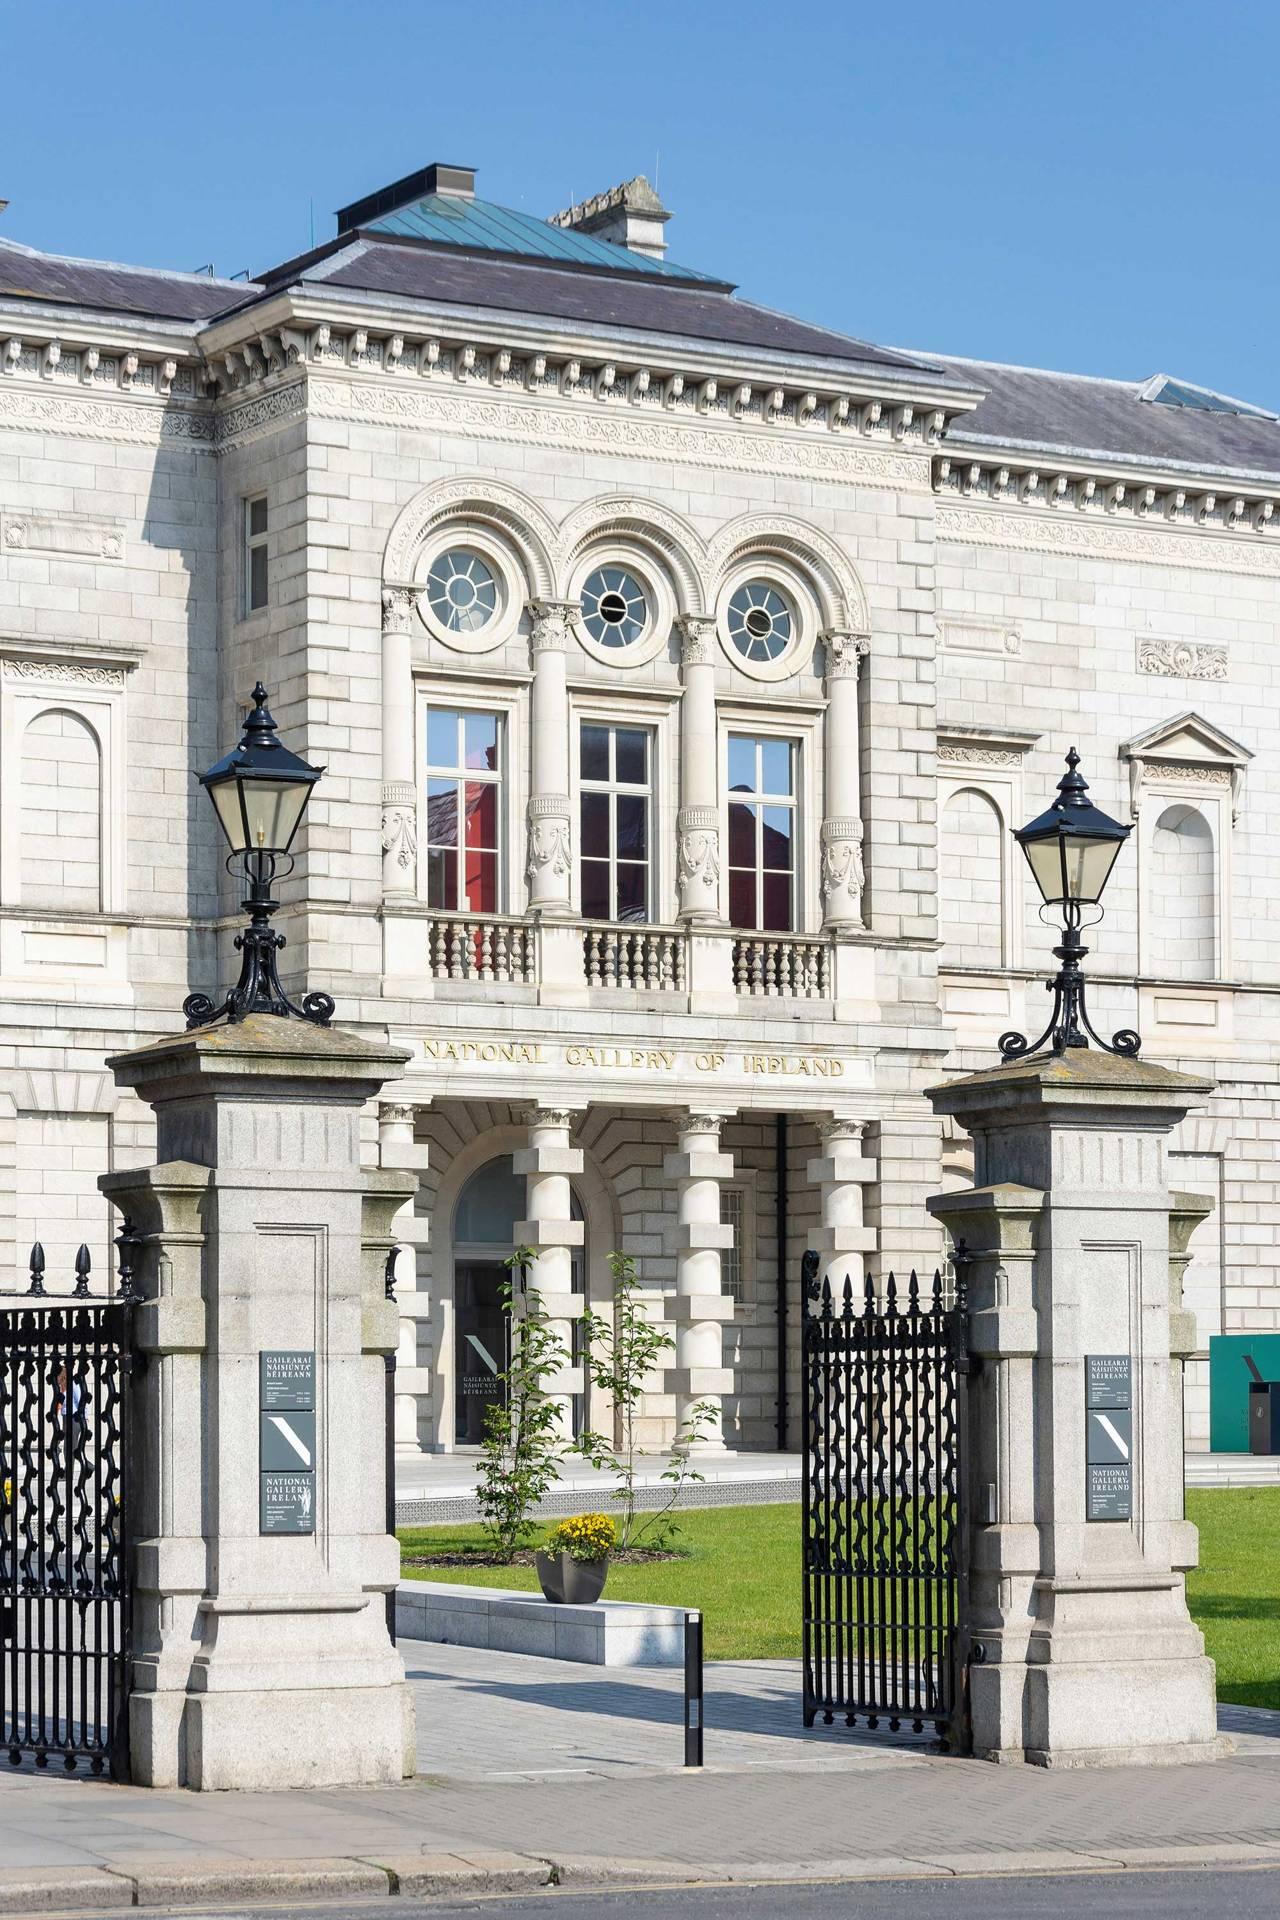 Galerie nationale d'Irlande, Dublin